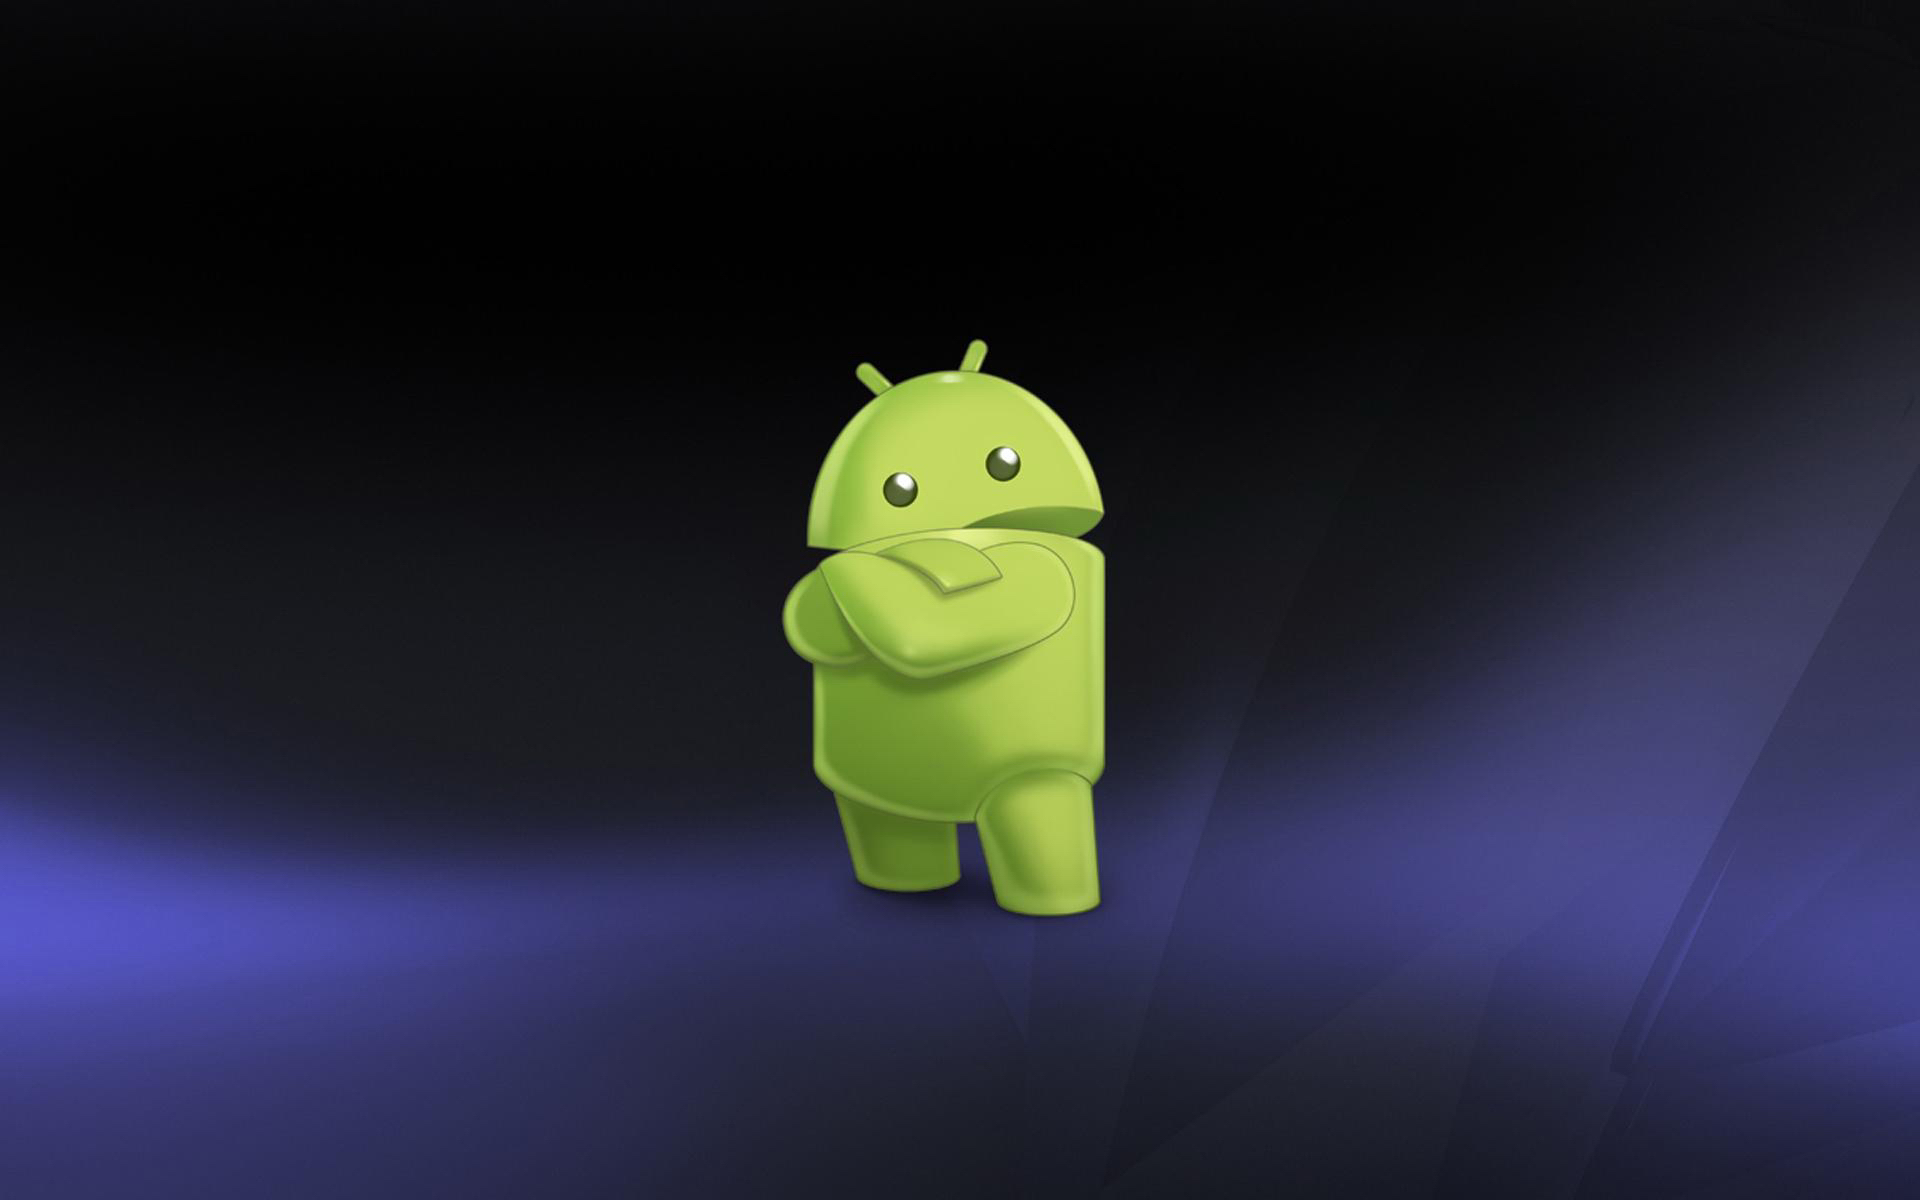 Обои на рабочий стол компьютера android